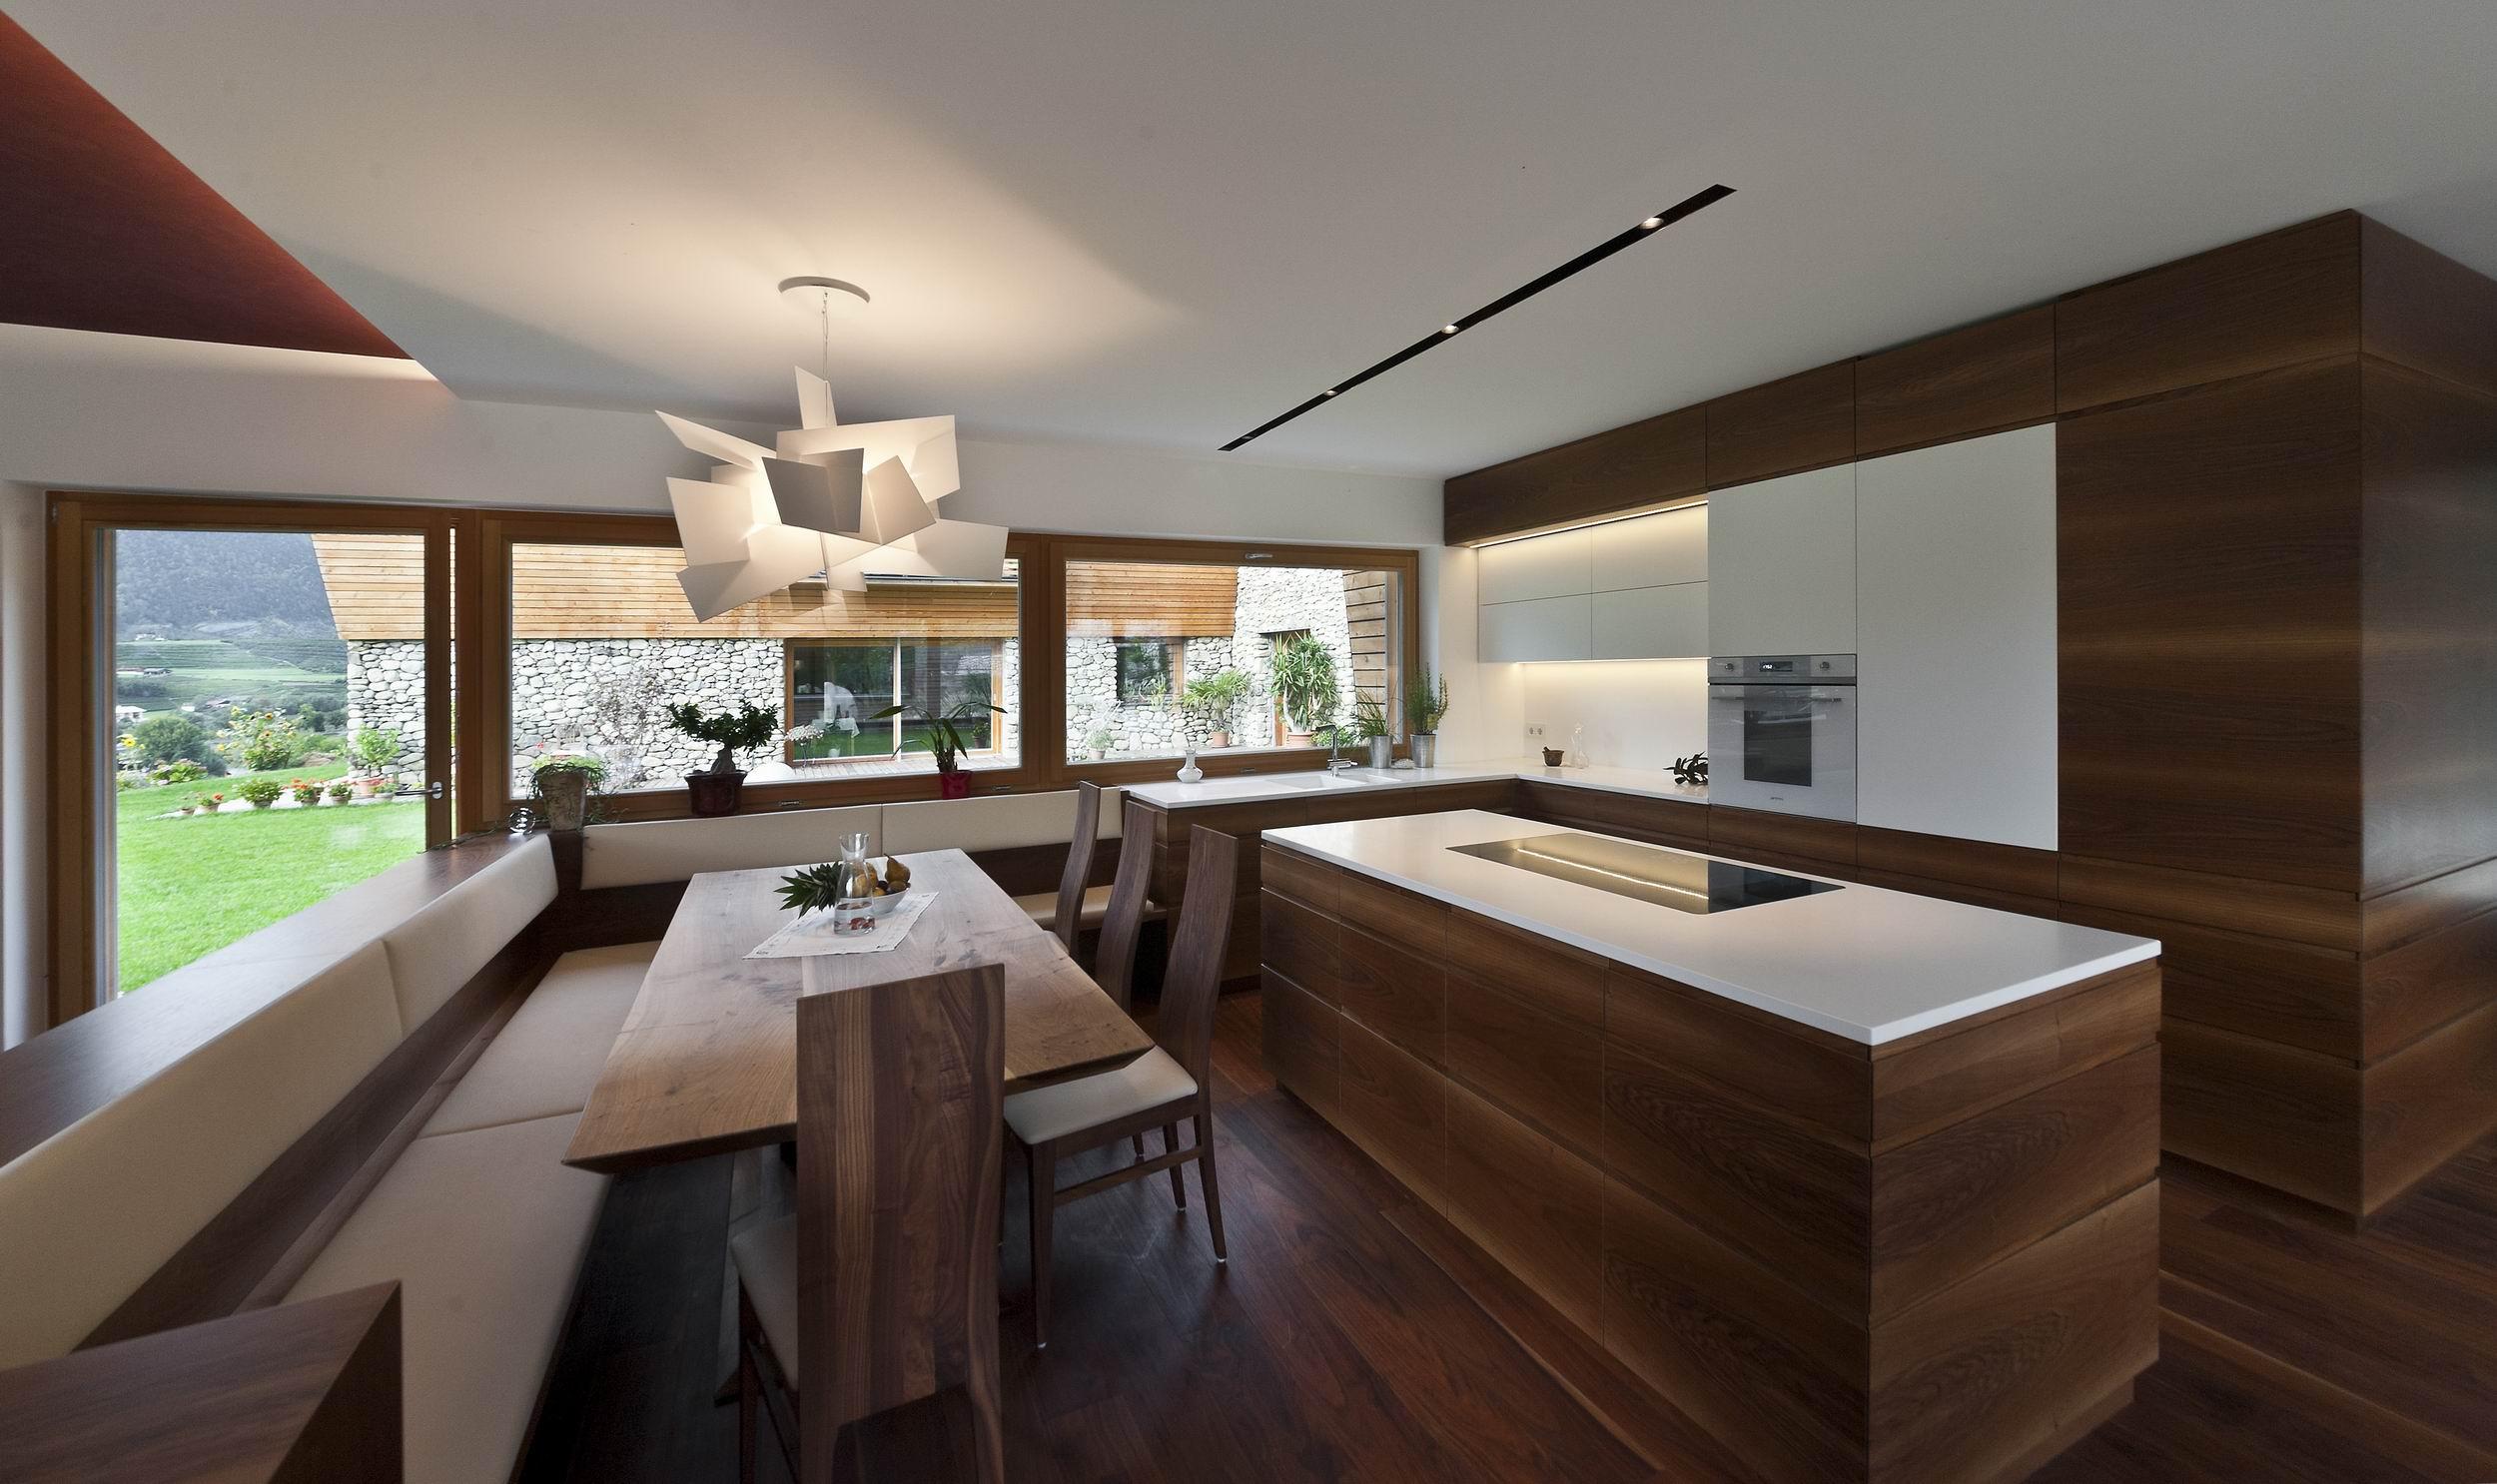 haus brunner vahrn lampelehof vahrn brunner andreas space dalsass. Black Bedroom Furniture Sets. Home Design Ideas